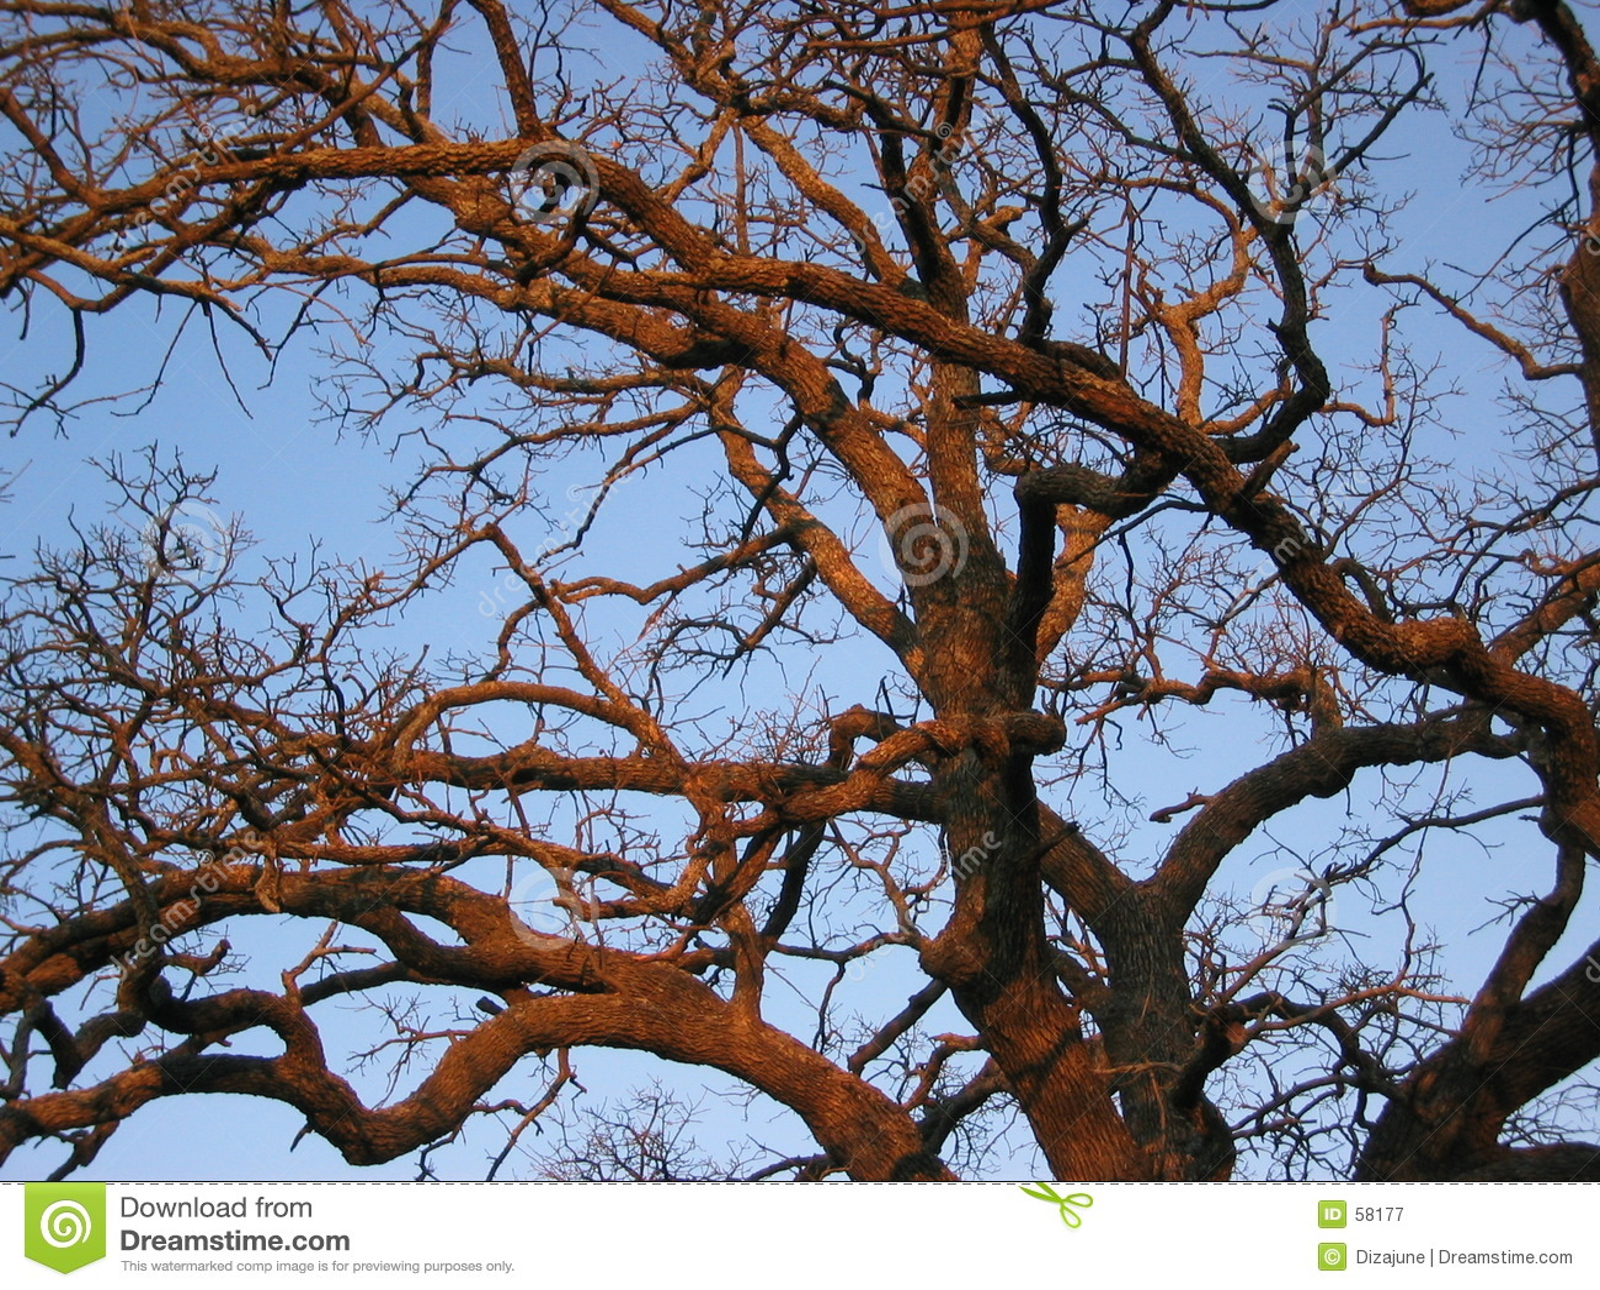 Sunset oak tree